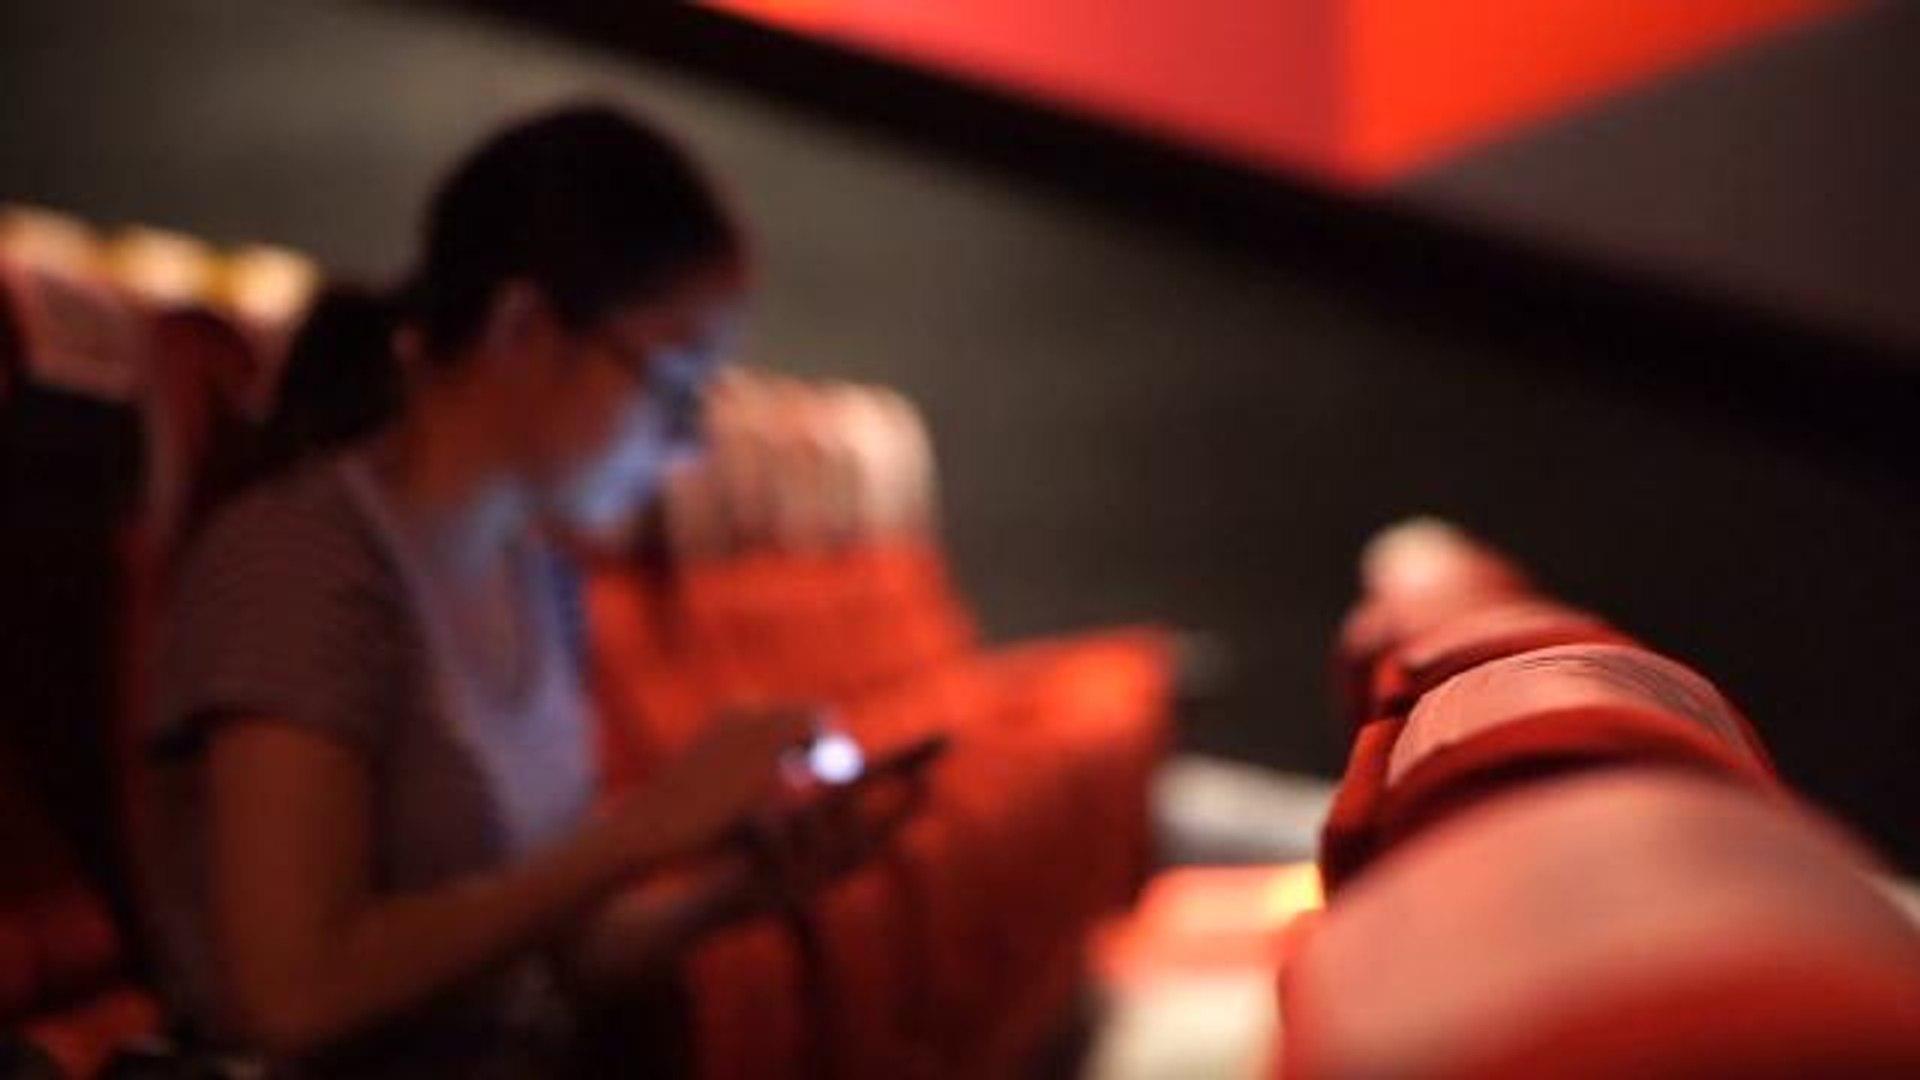 Brave Moviegoers in Sweden will Watch Sci-Fi Thriller From Inside Coffin